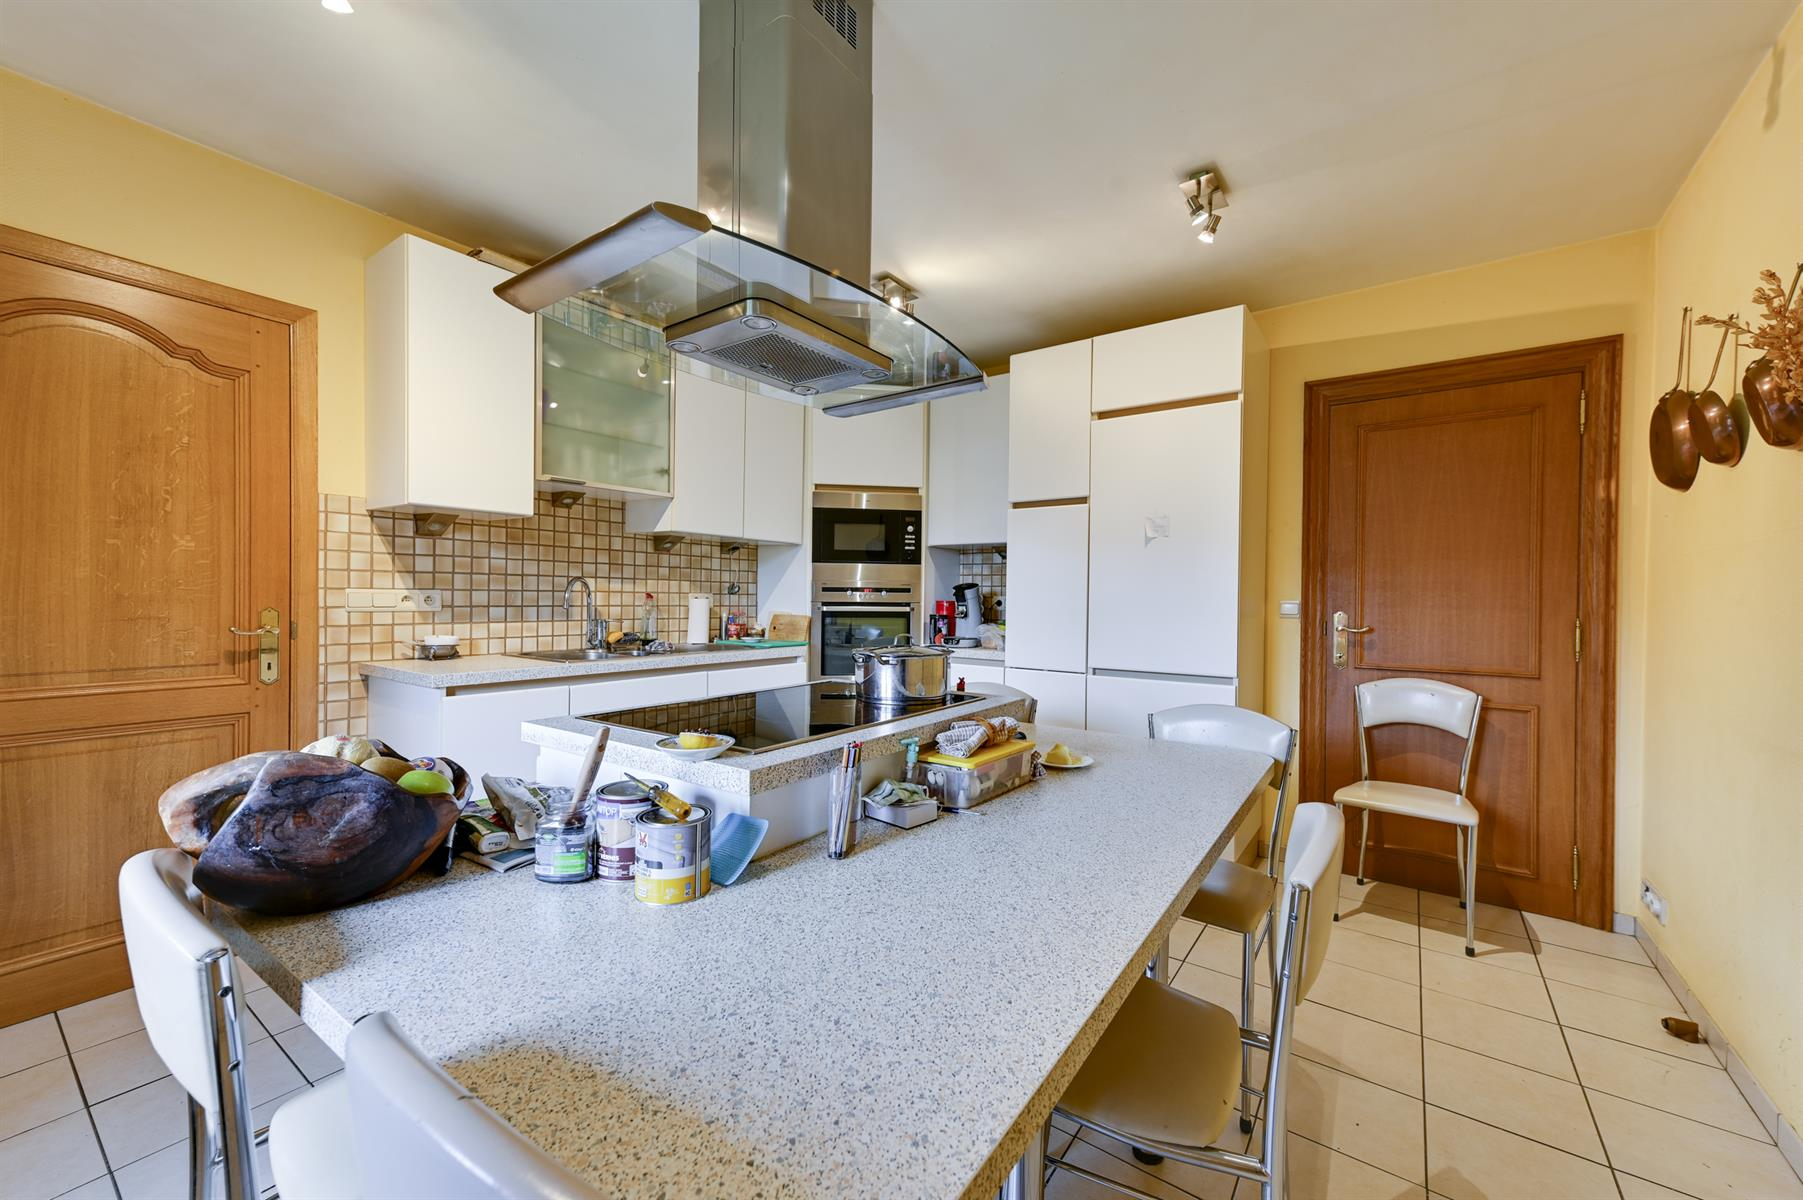 Maison - Rochefort - #4072672-15